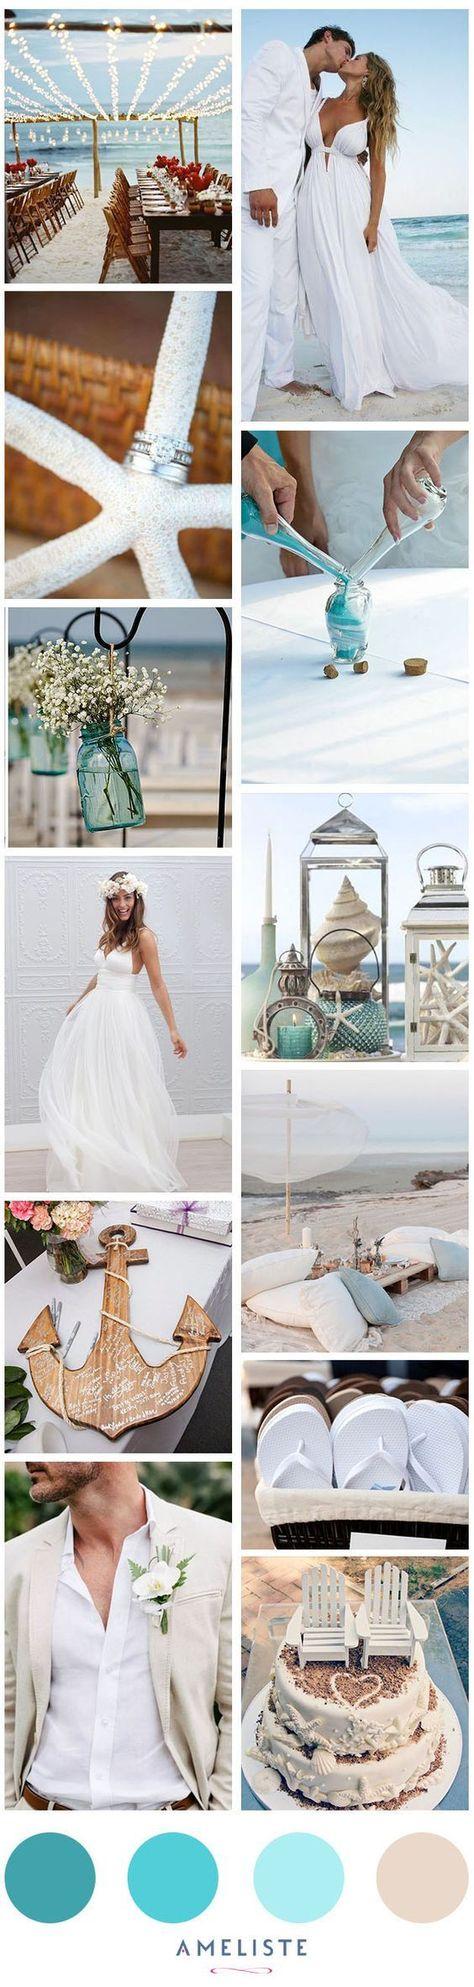 Glass boat wedding